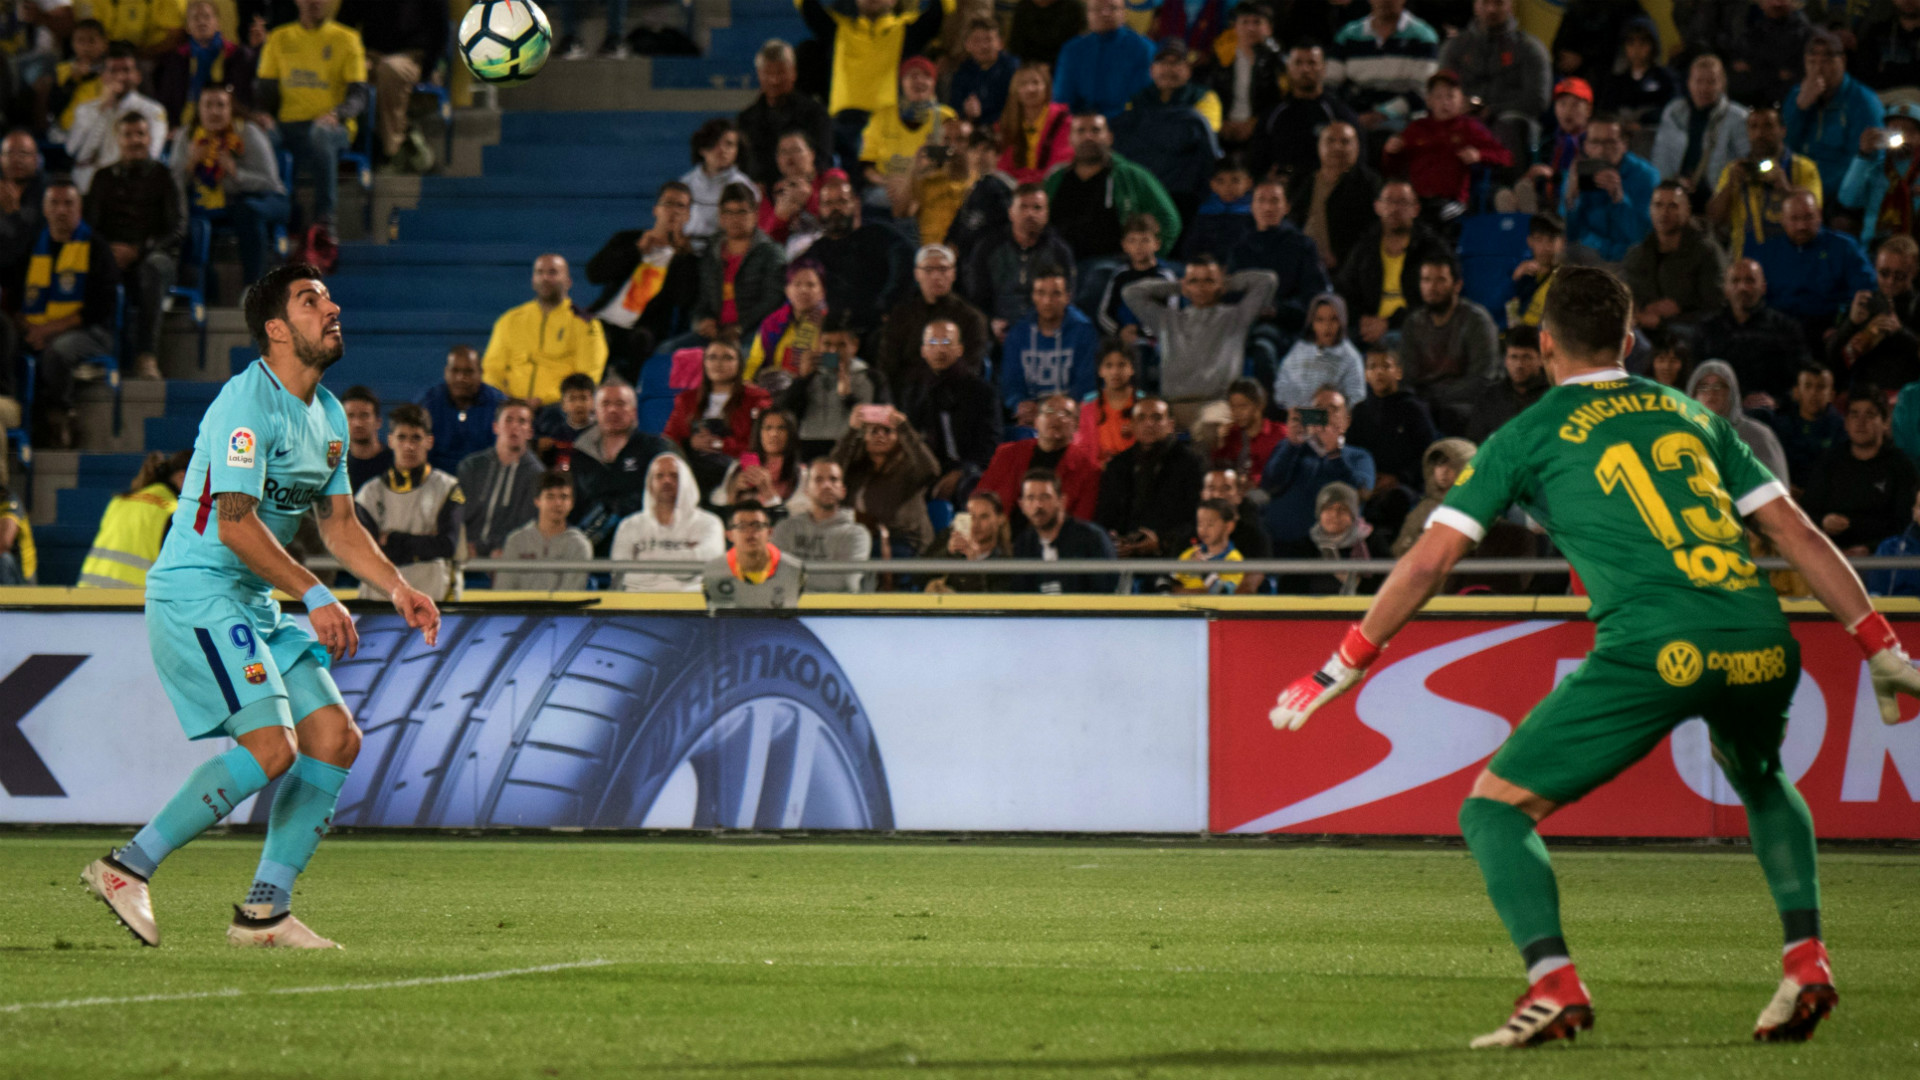 Barcelona empata con Las Palmas y reduce ventaja en liga española